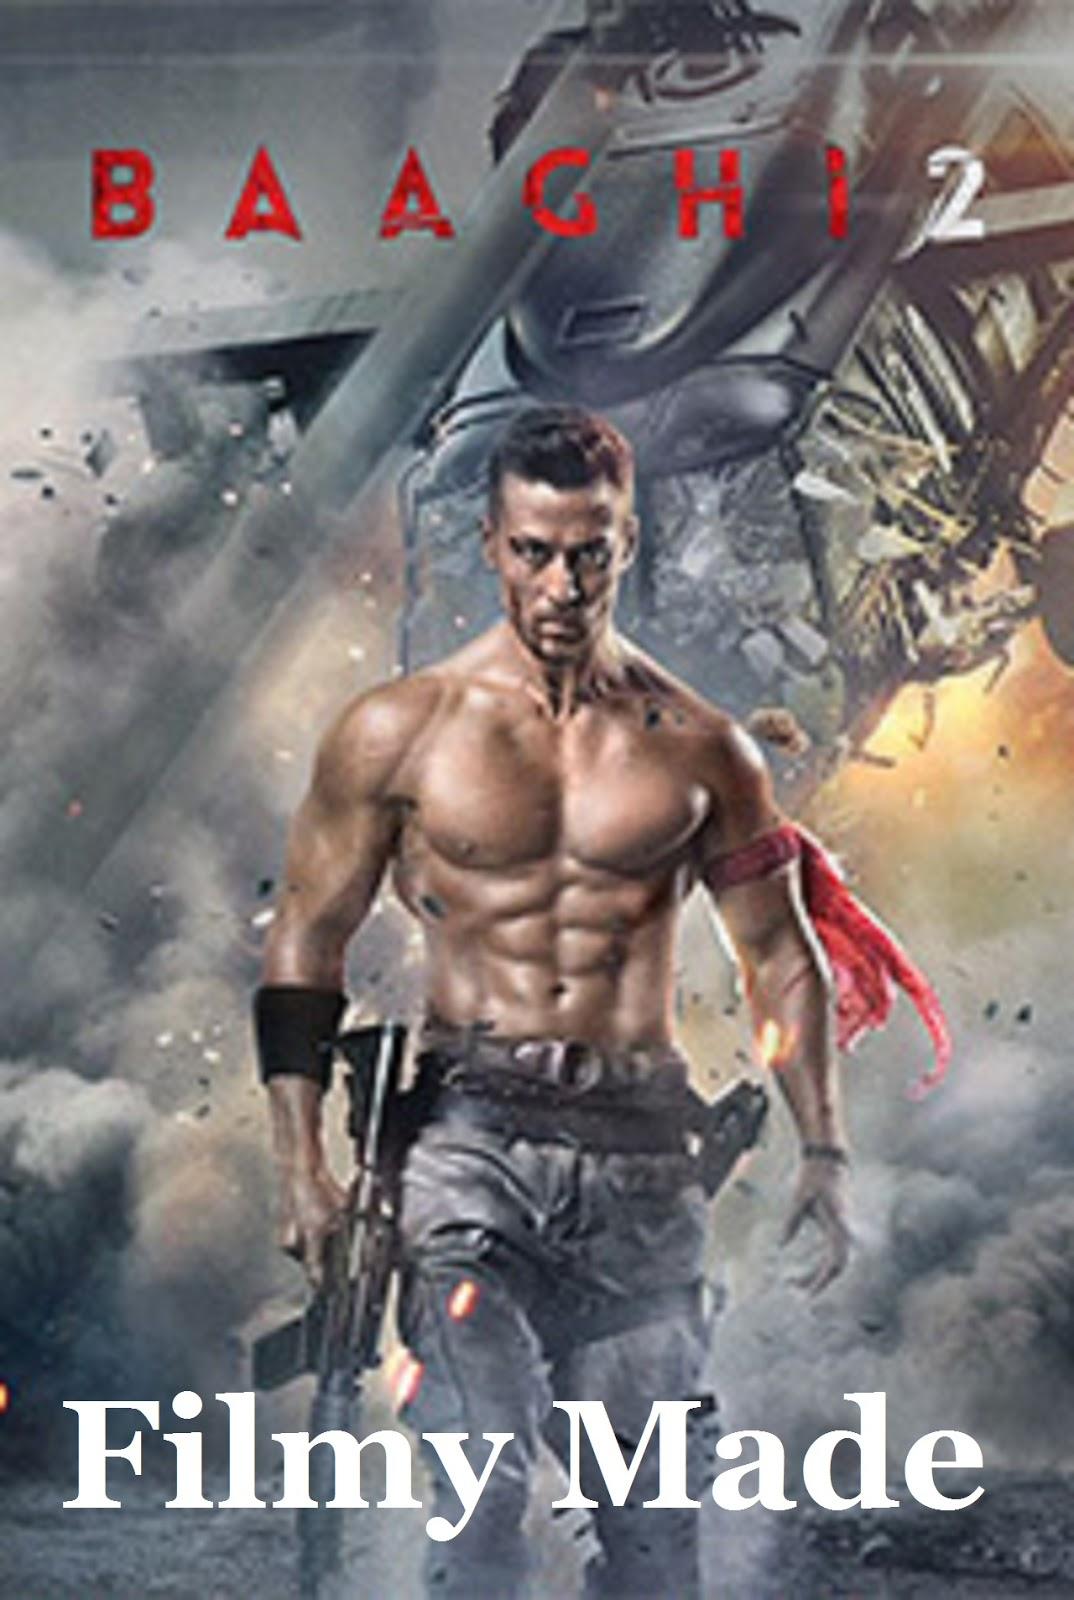 Baaghi 2 full movie download 720p hd 1.2Gb mkv movie free